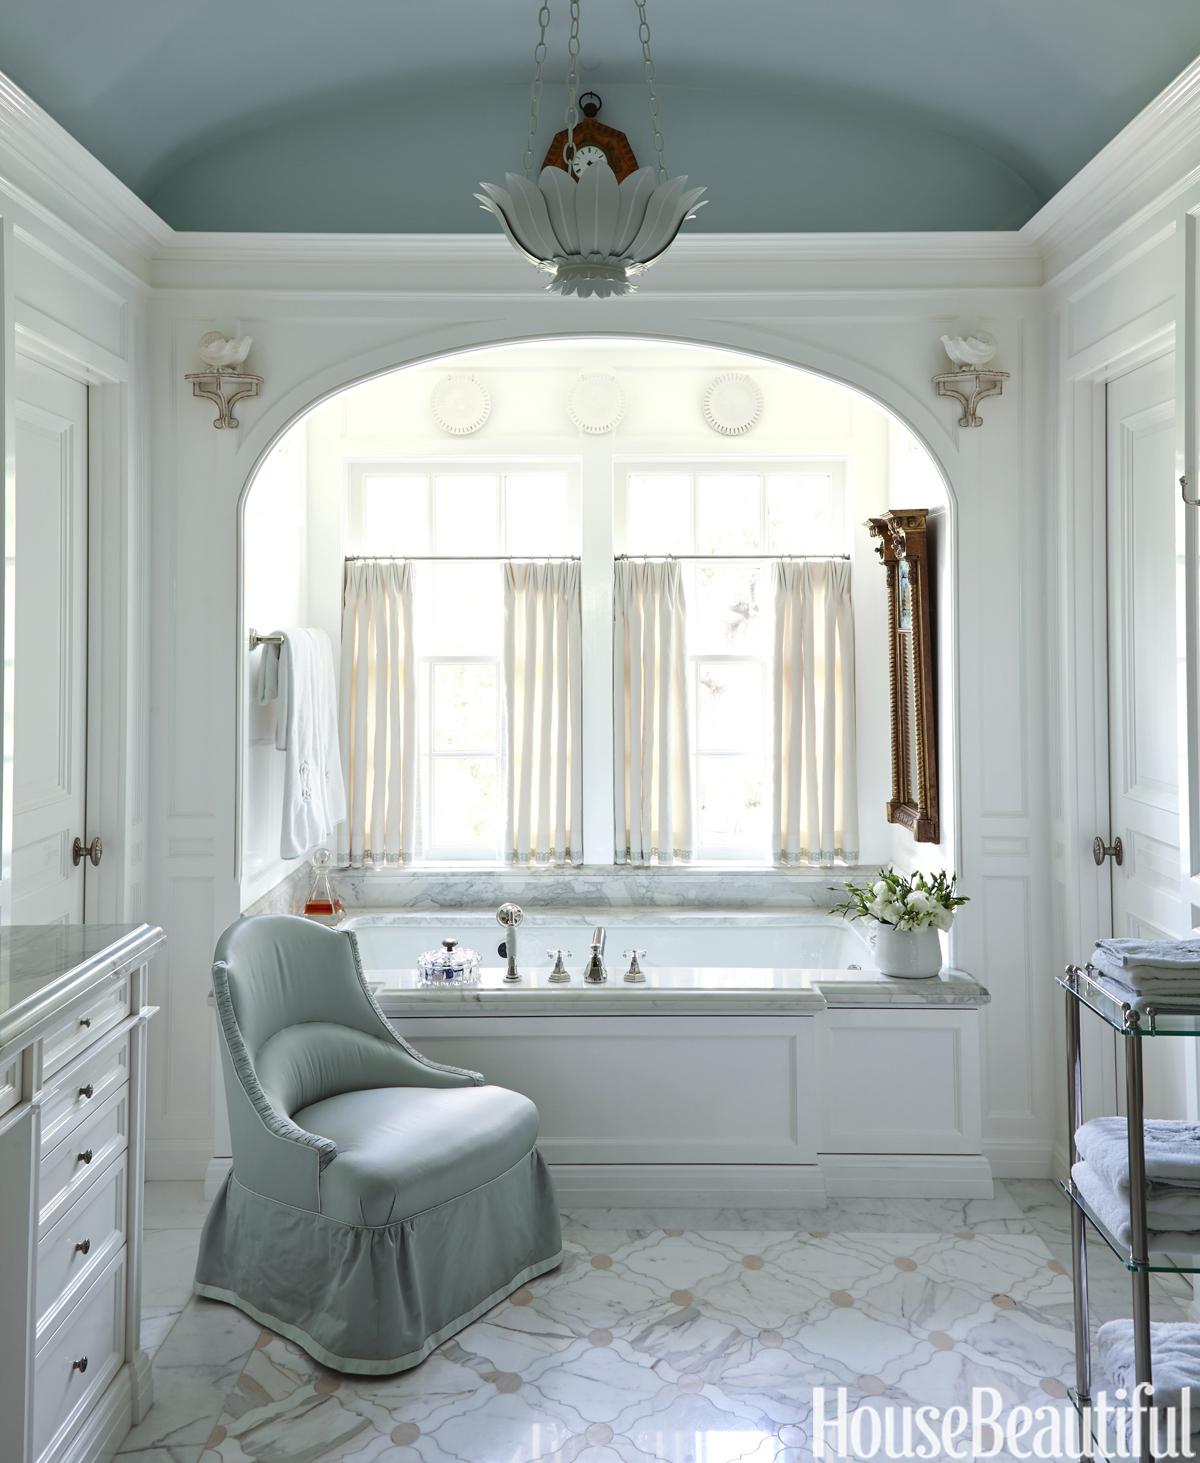 Bathroom Art Ceiling: Ceiling Decorating Ideas